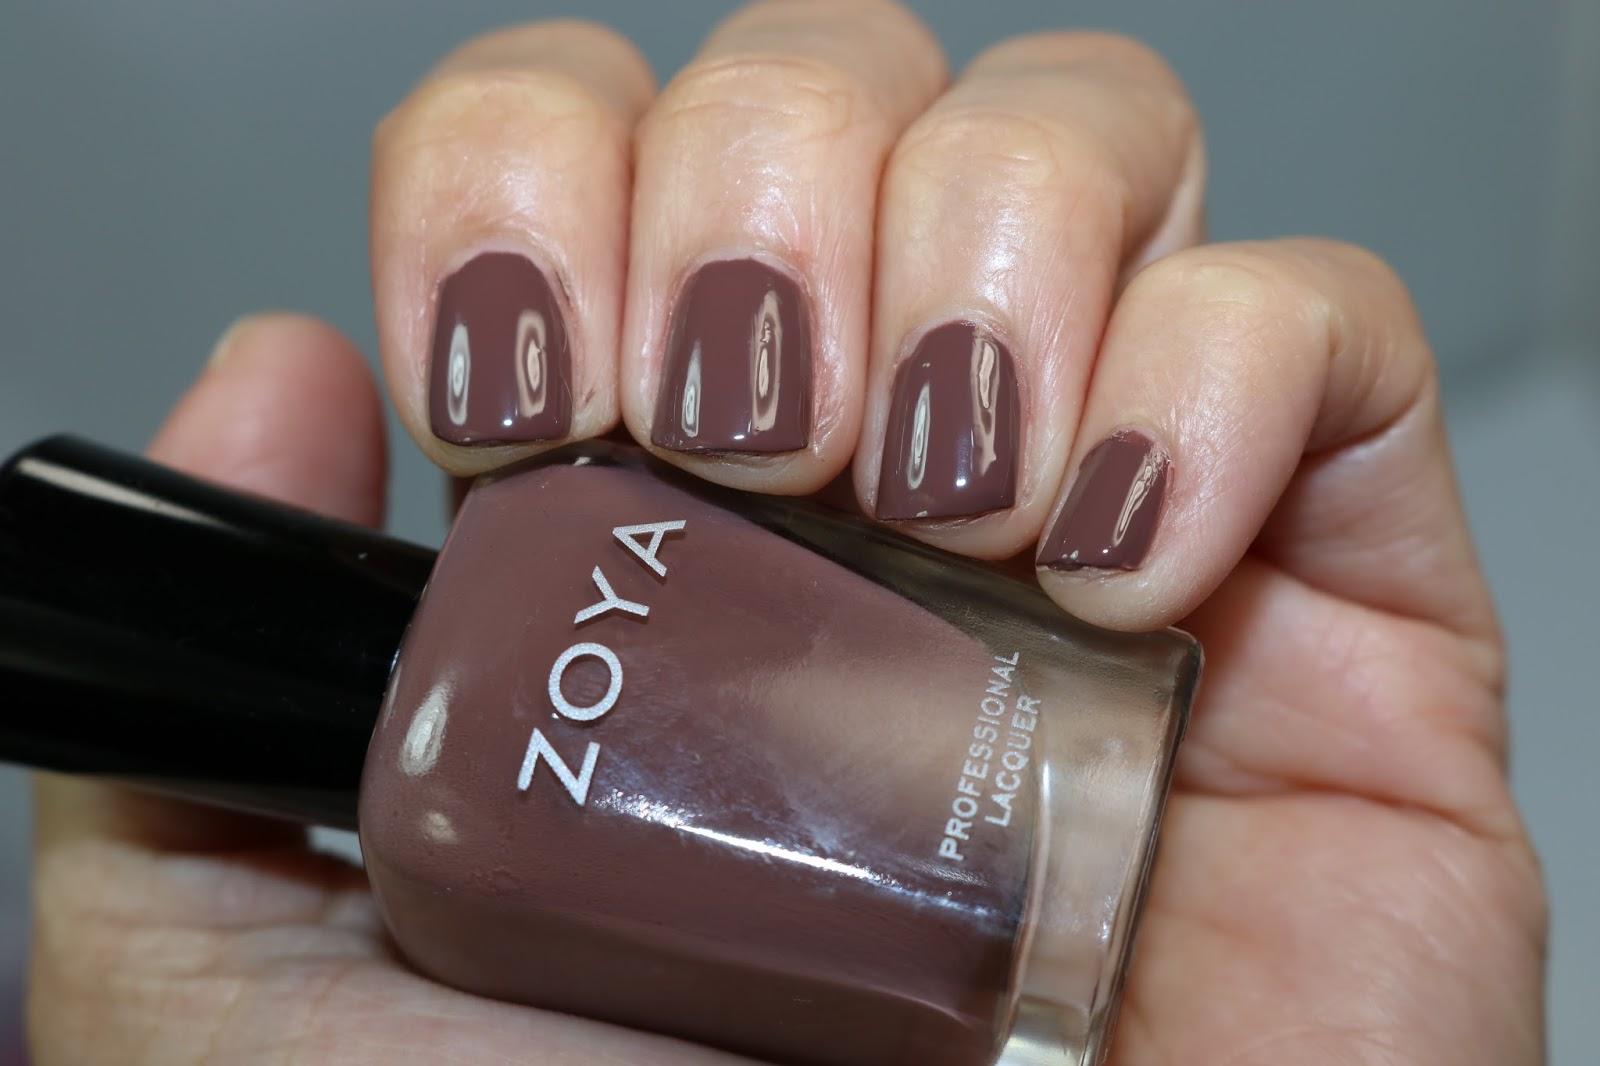 Zoya Nail Polish Naturel 3 Collection Swatches, Review - The Shades Of U